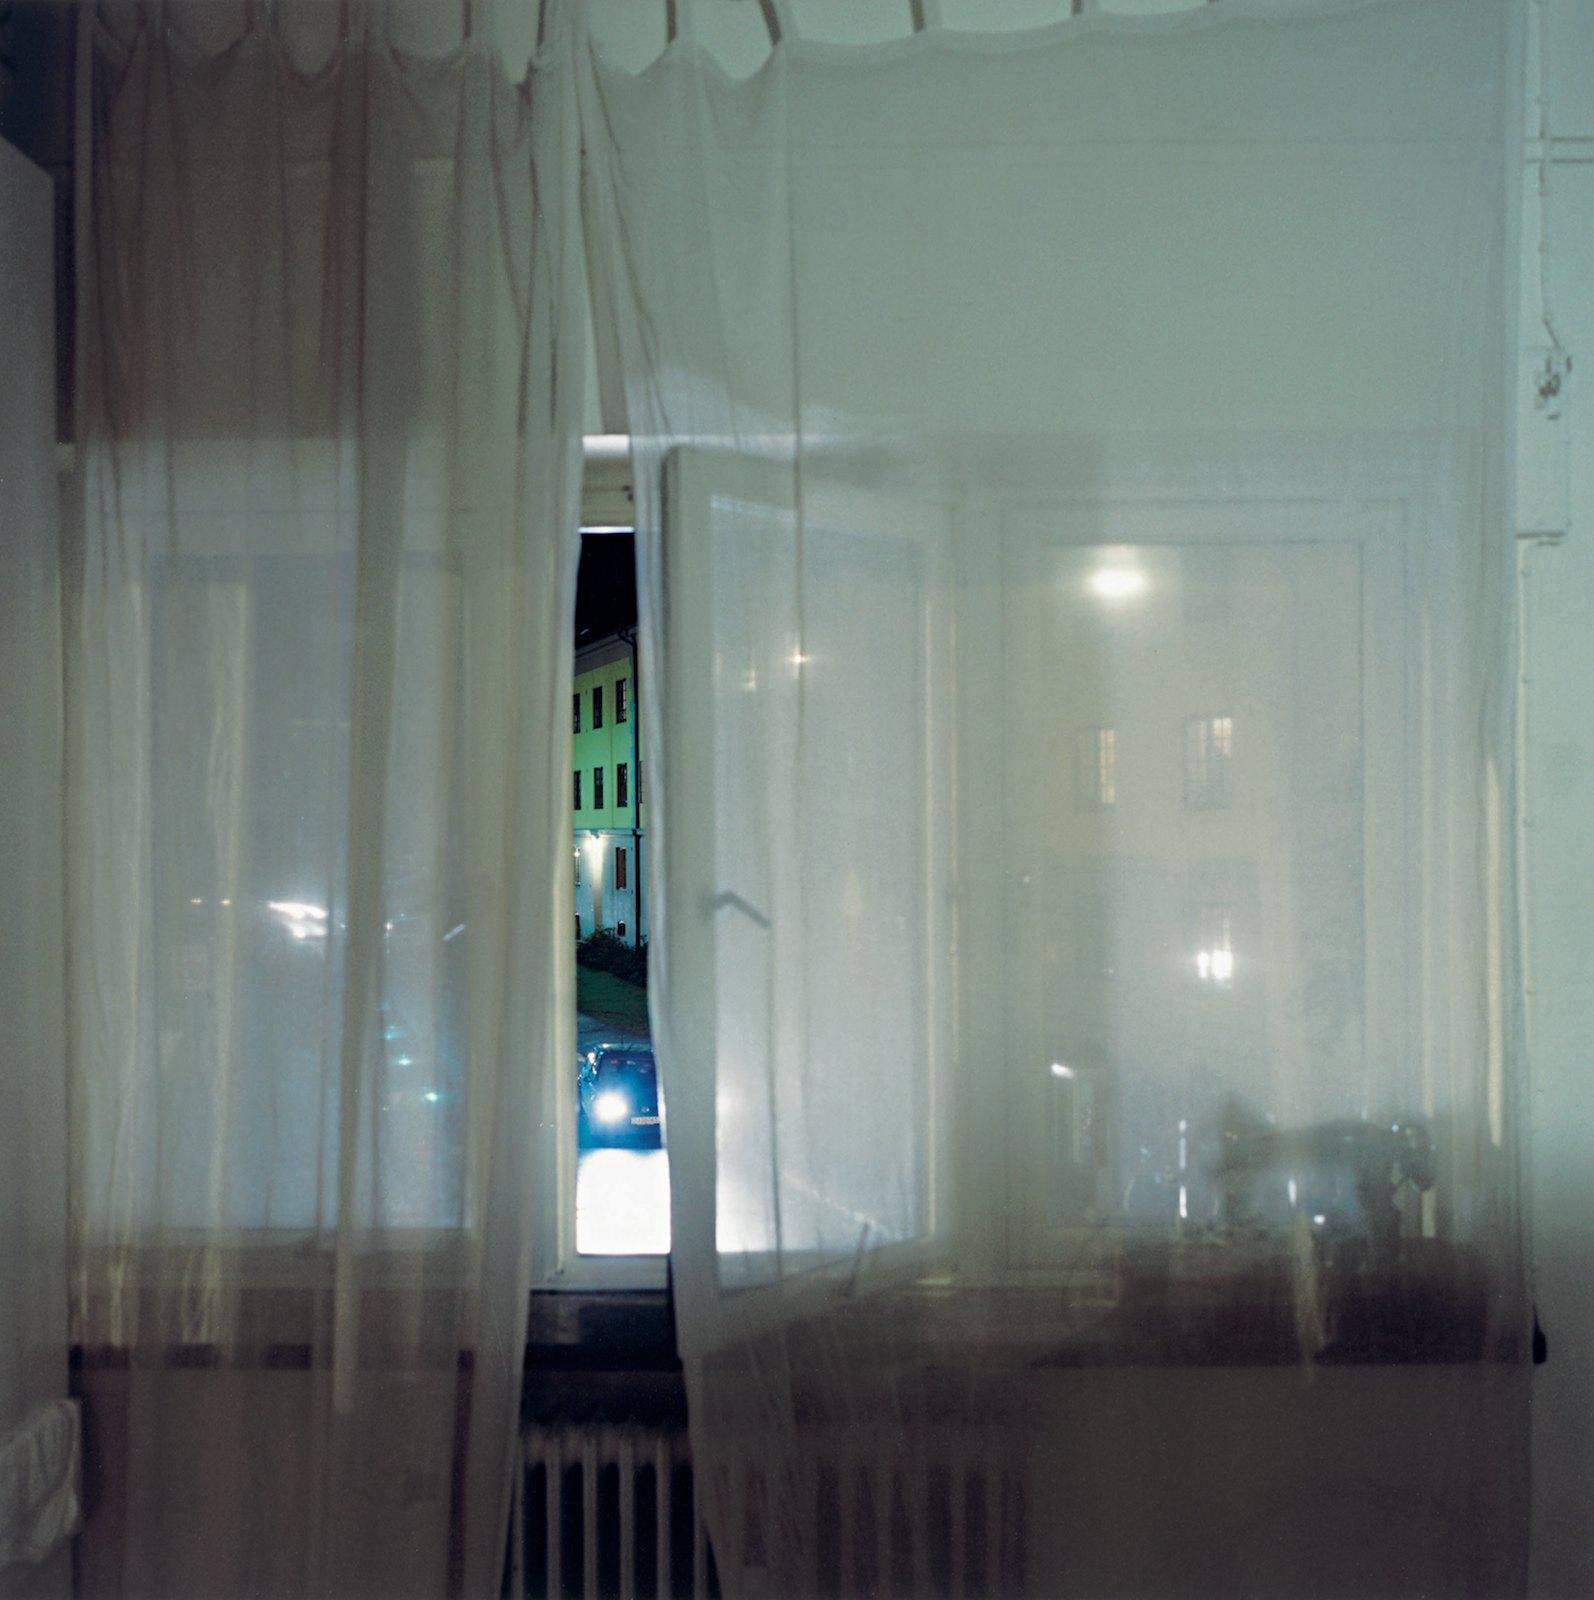 The Car 21:30, 2008, C-print, 100 x 100 cm